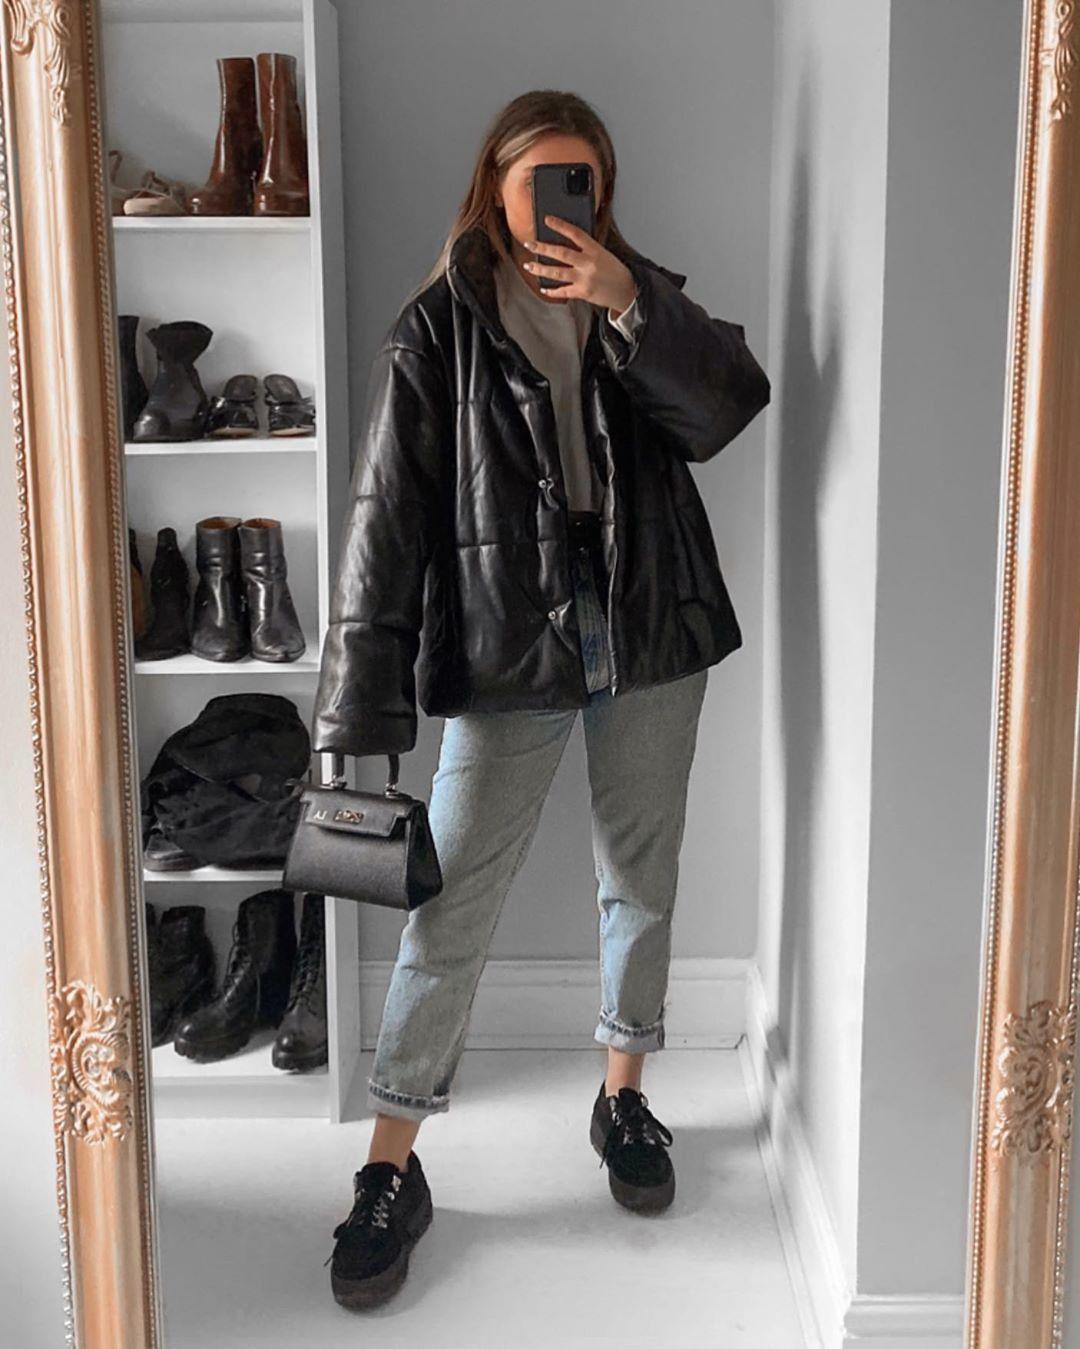 By Fashioninflux Winter Coats Puffer Jacket Style Leather Puffer Jacket Winter Fashion Outfits [ 1349 x 1080 Pixel ]